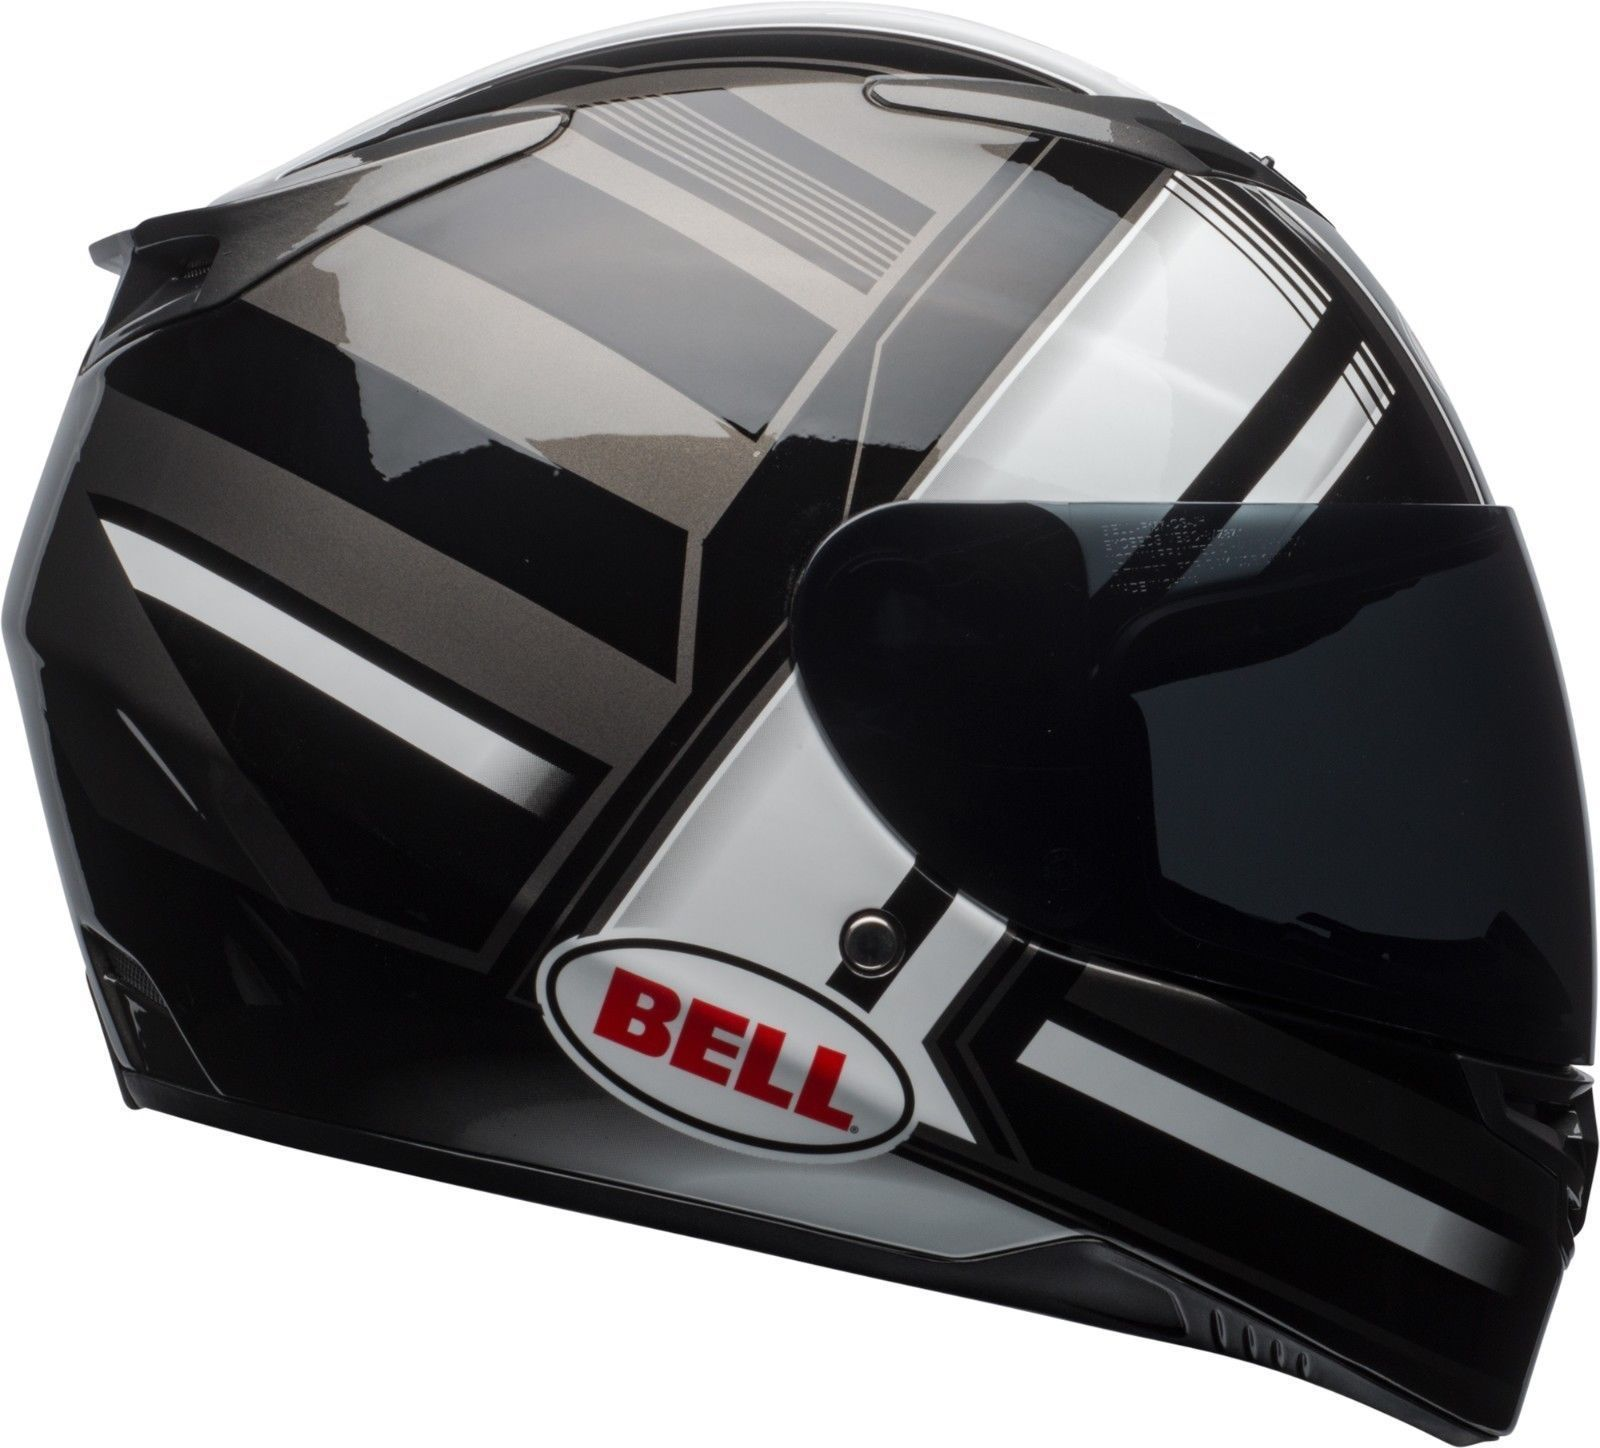 Bell RS-2 Full Face Motorcycle Helmet with InternalSun Visor Eye Wear Friendly